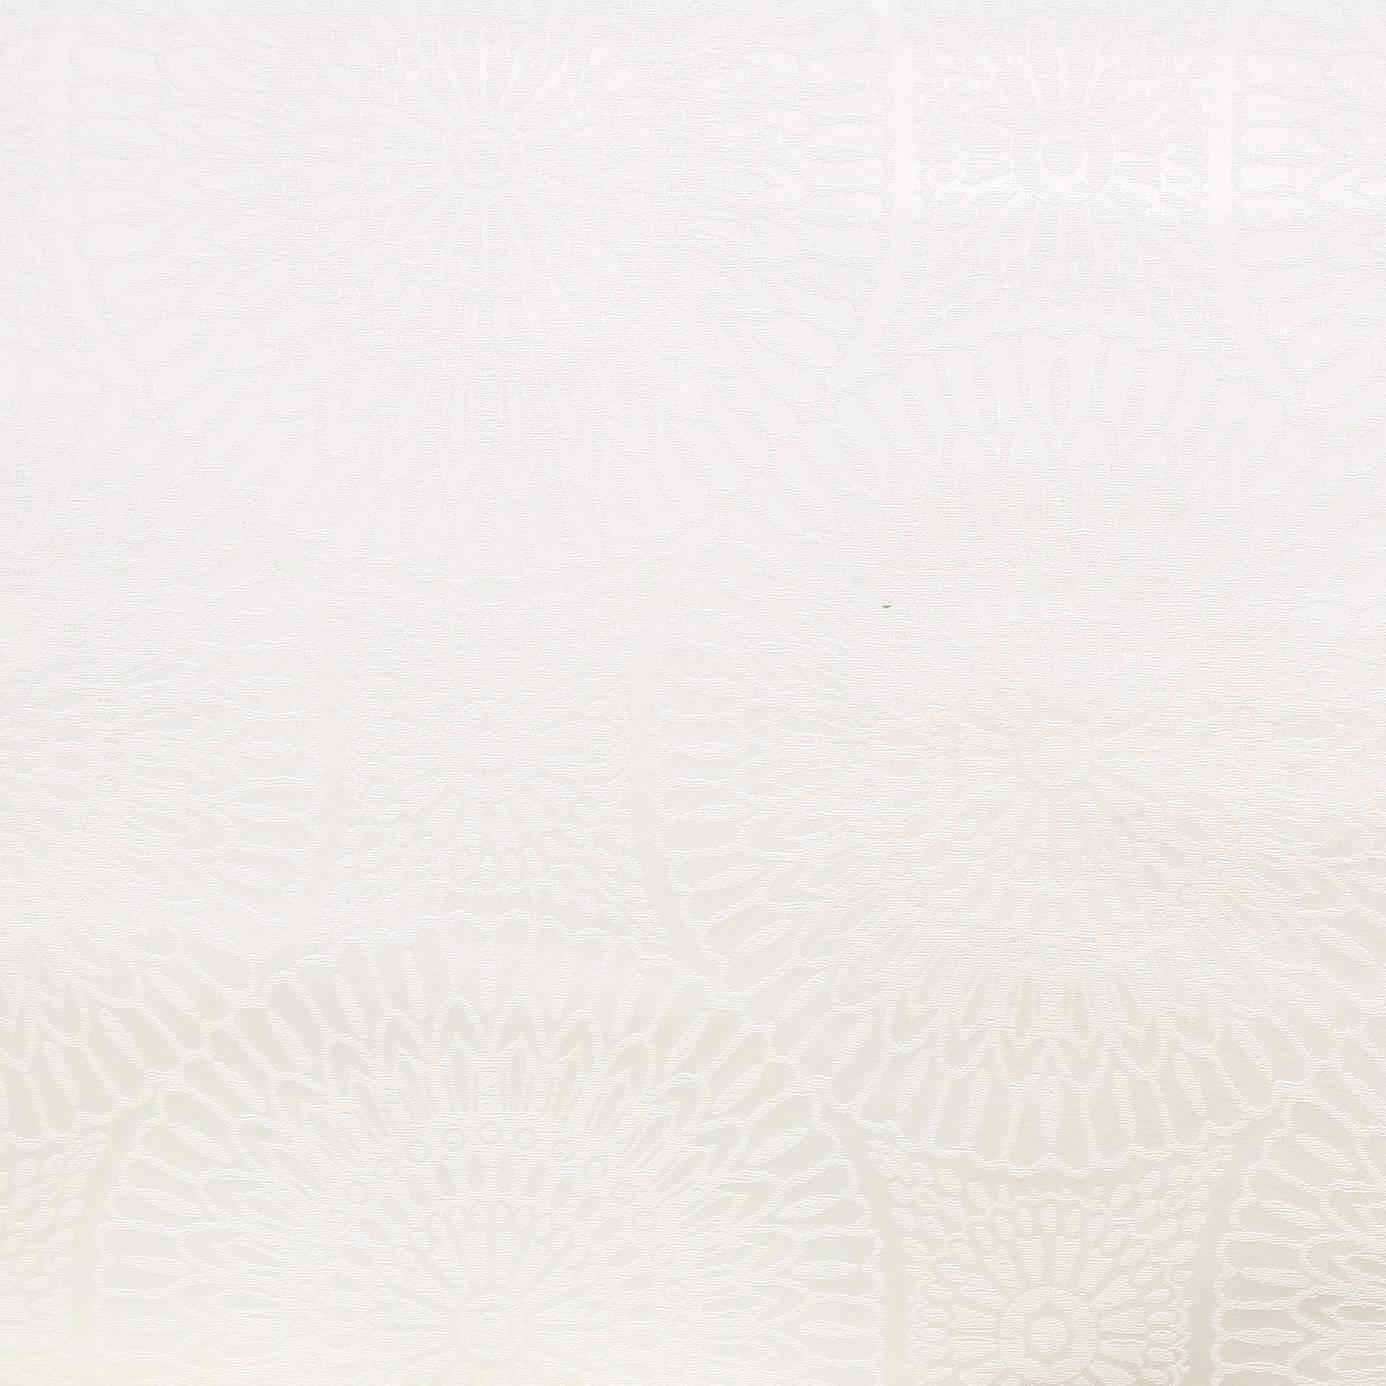 roman blinds in etoile fabric blanc 27790111. Black Bedroom Furniture Sets. Home Design Ideas